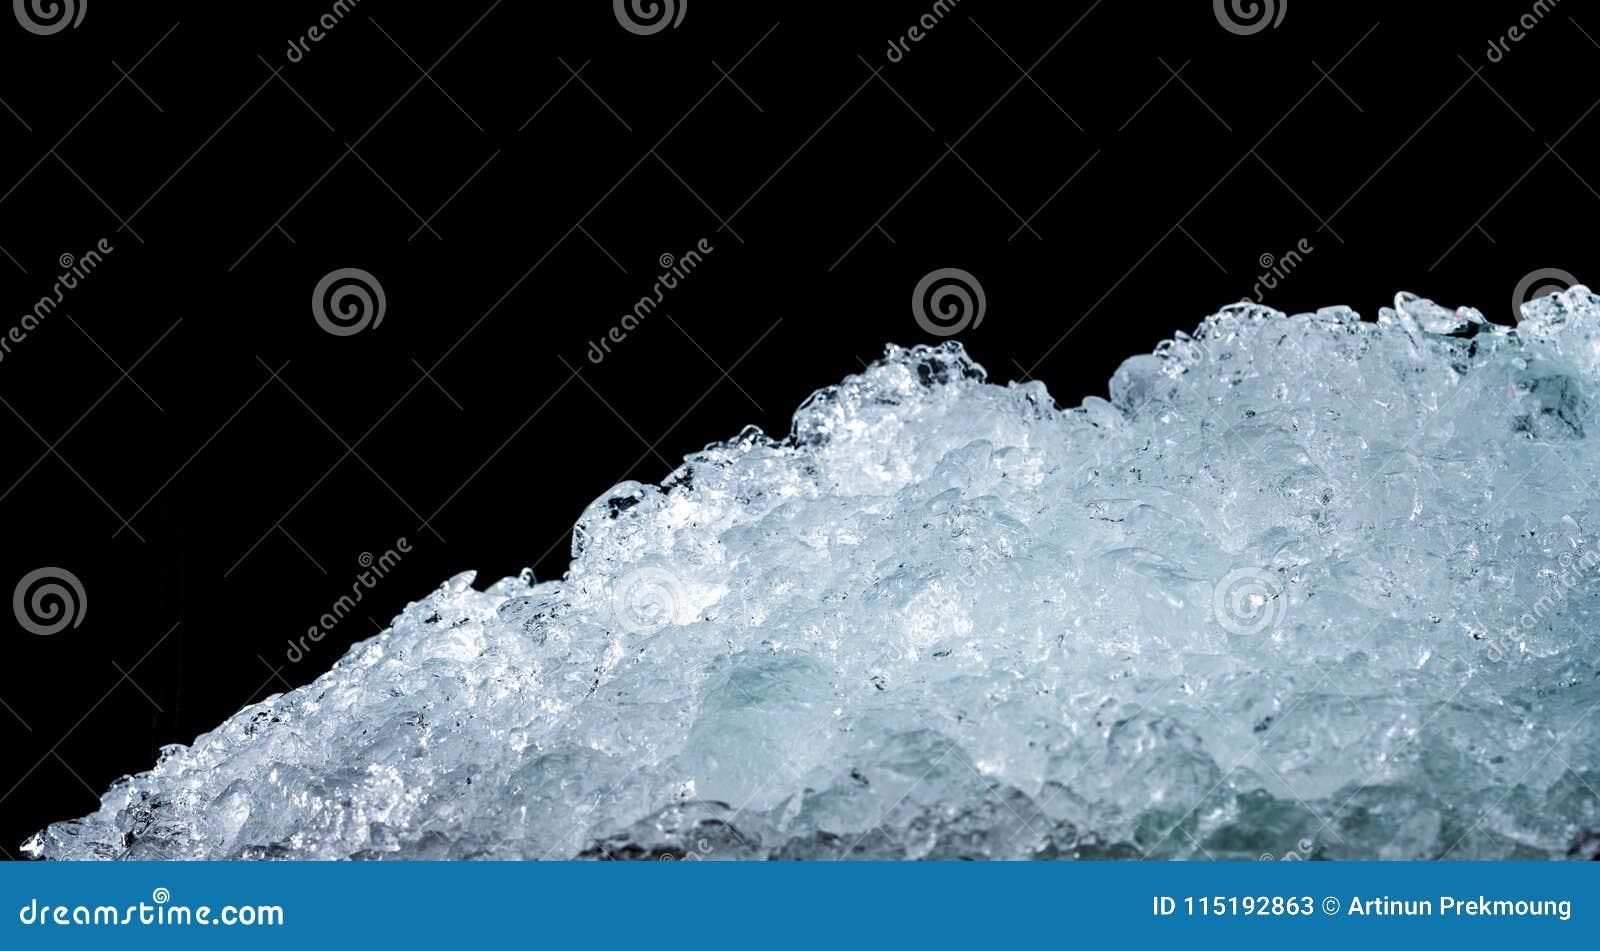 Stos zdruzgotane kostki lodu na ciemnym tle z kopii przestrzenią Zdruzgotane kostki lodu pierwszoplanowe dla napojów, piwo, whisk